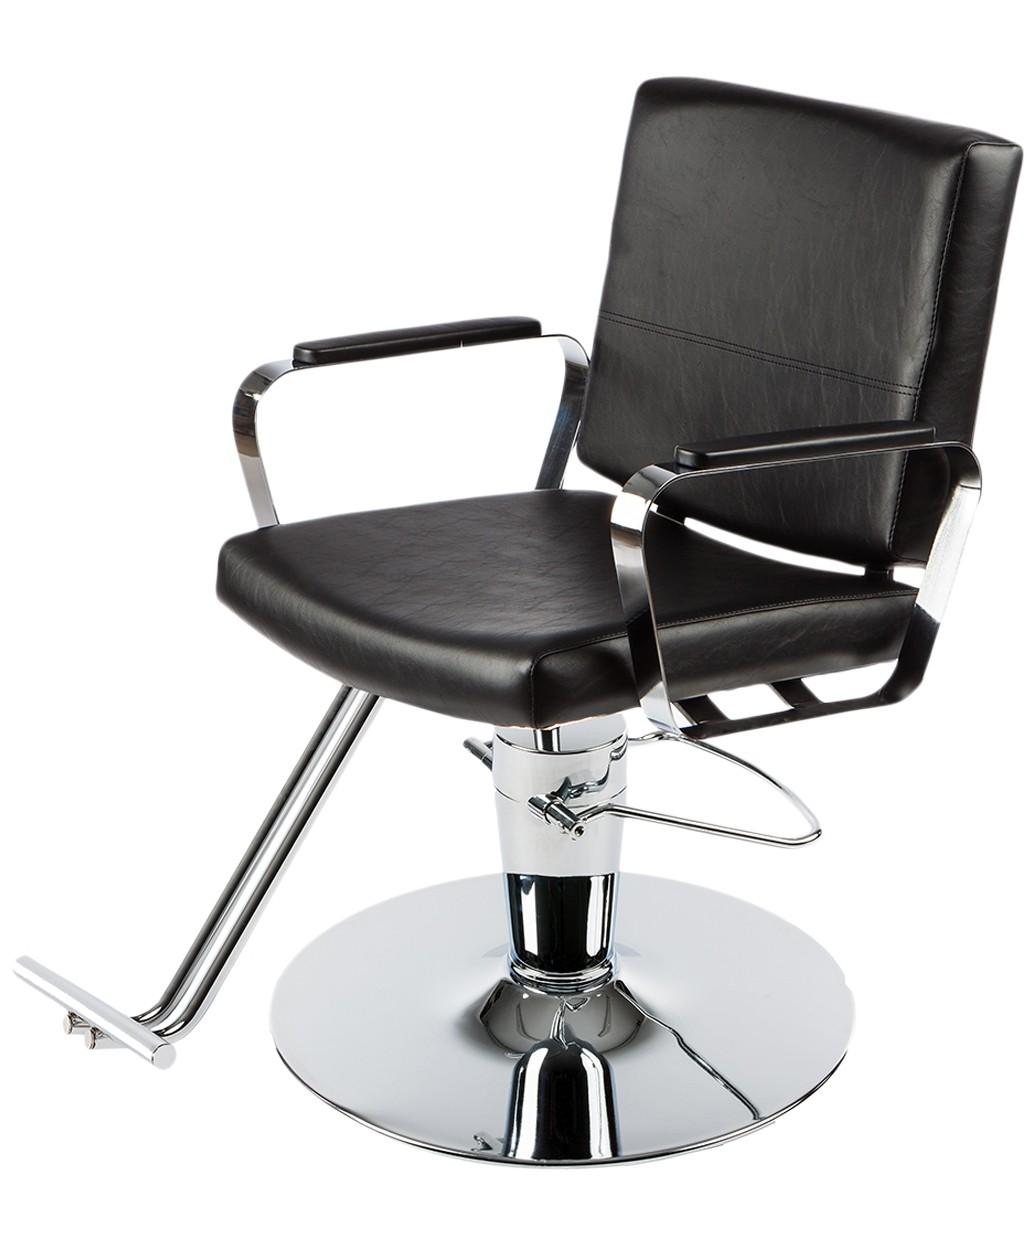 Belvedere Samantha Styling Chair